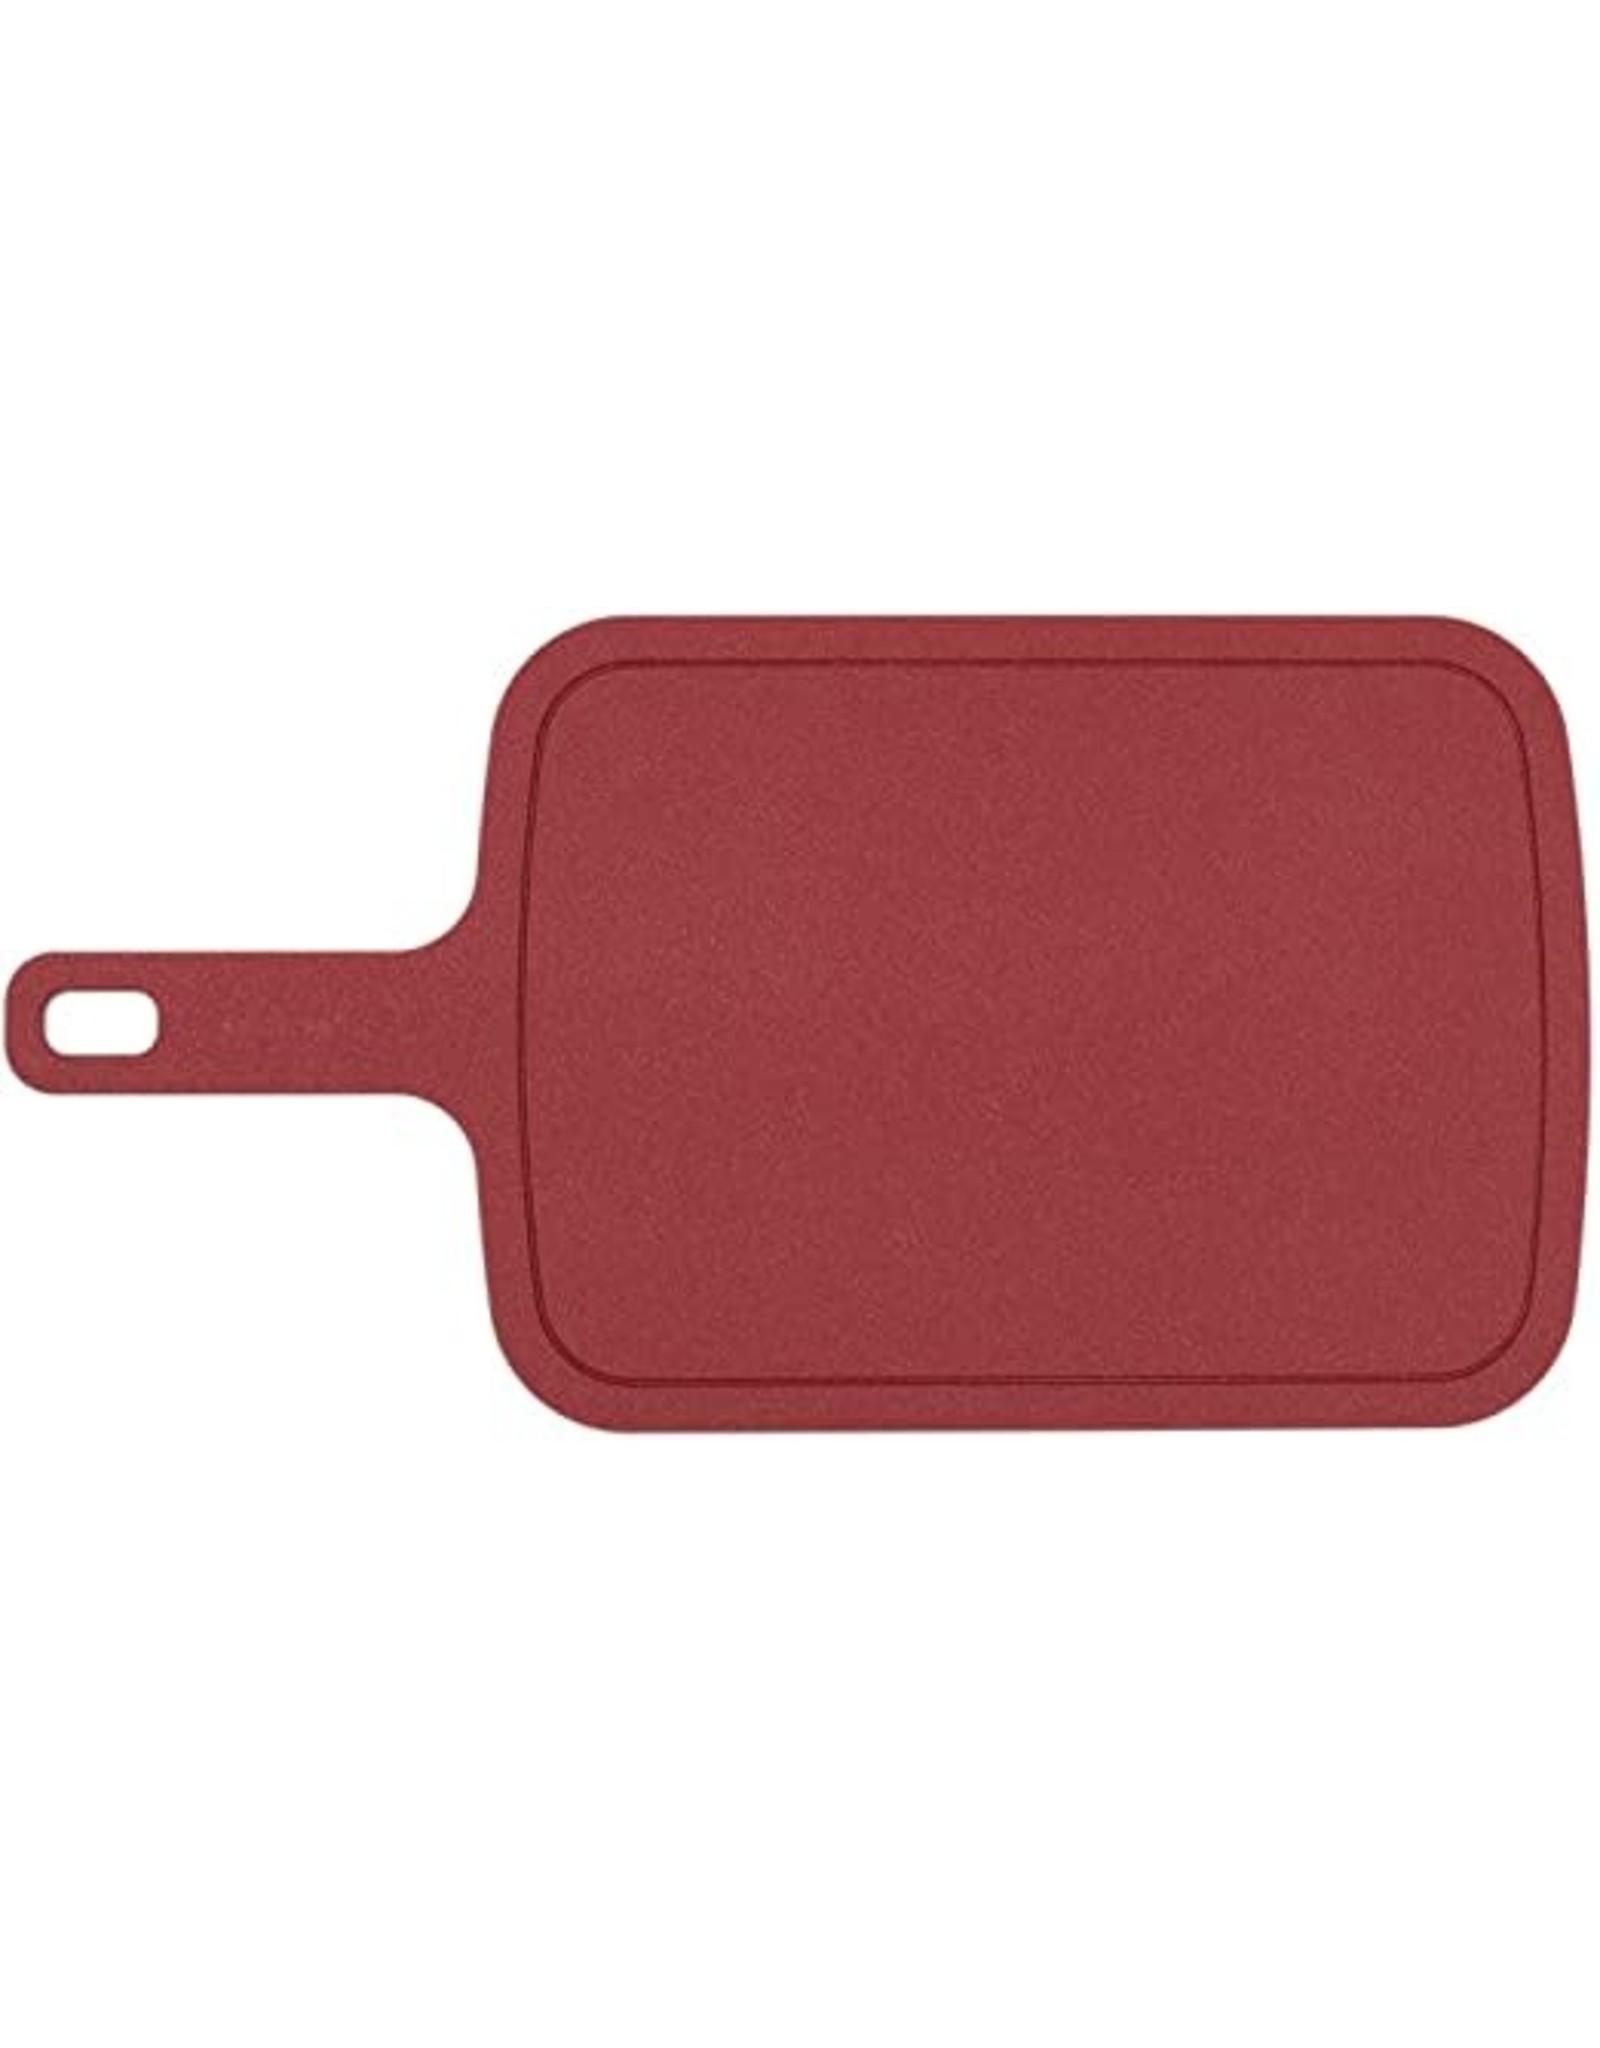 Epicurean Cutting Board w/Handle, Red, 10x8